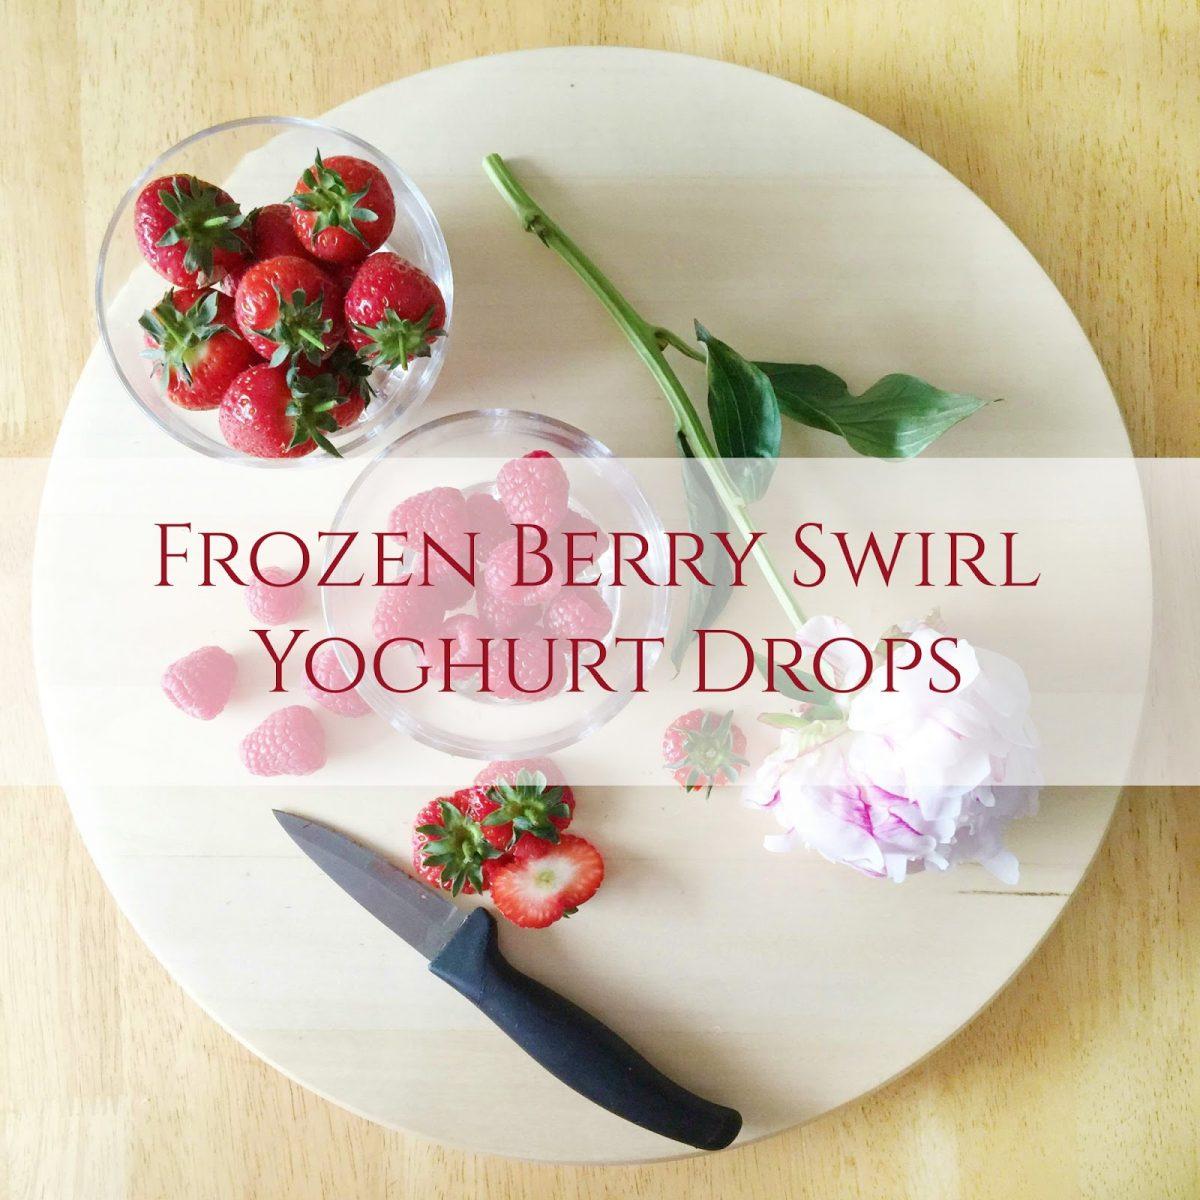 Frozen Berry Swirl Yoghurt Drops for Babies